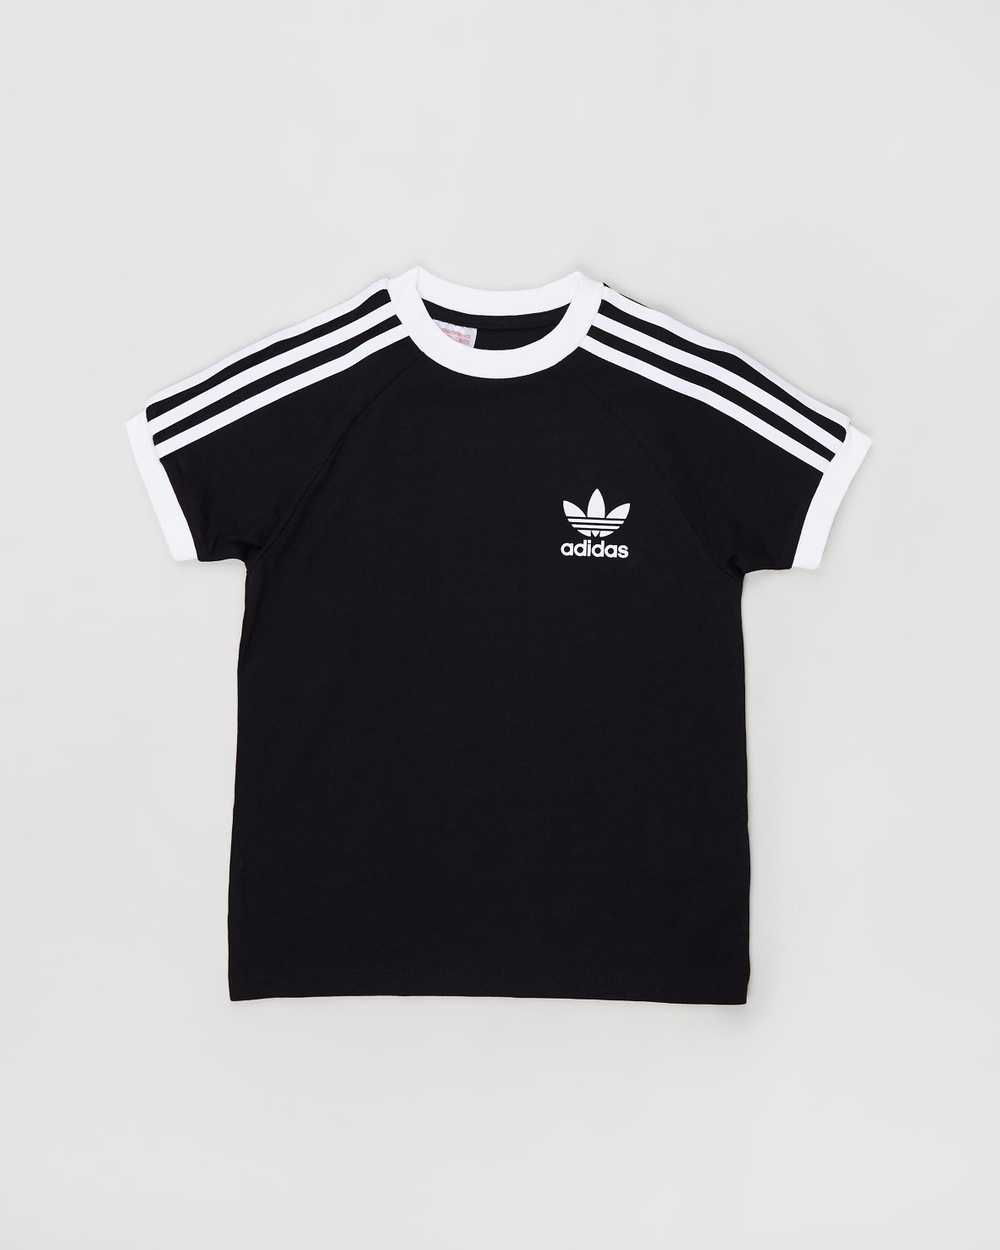 adidas Originals 3 Stripes Tee Short Sleeve T-Shirts Black 3-Stripes